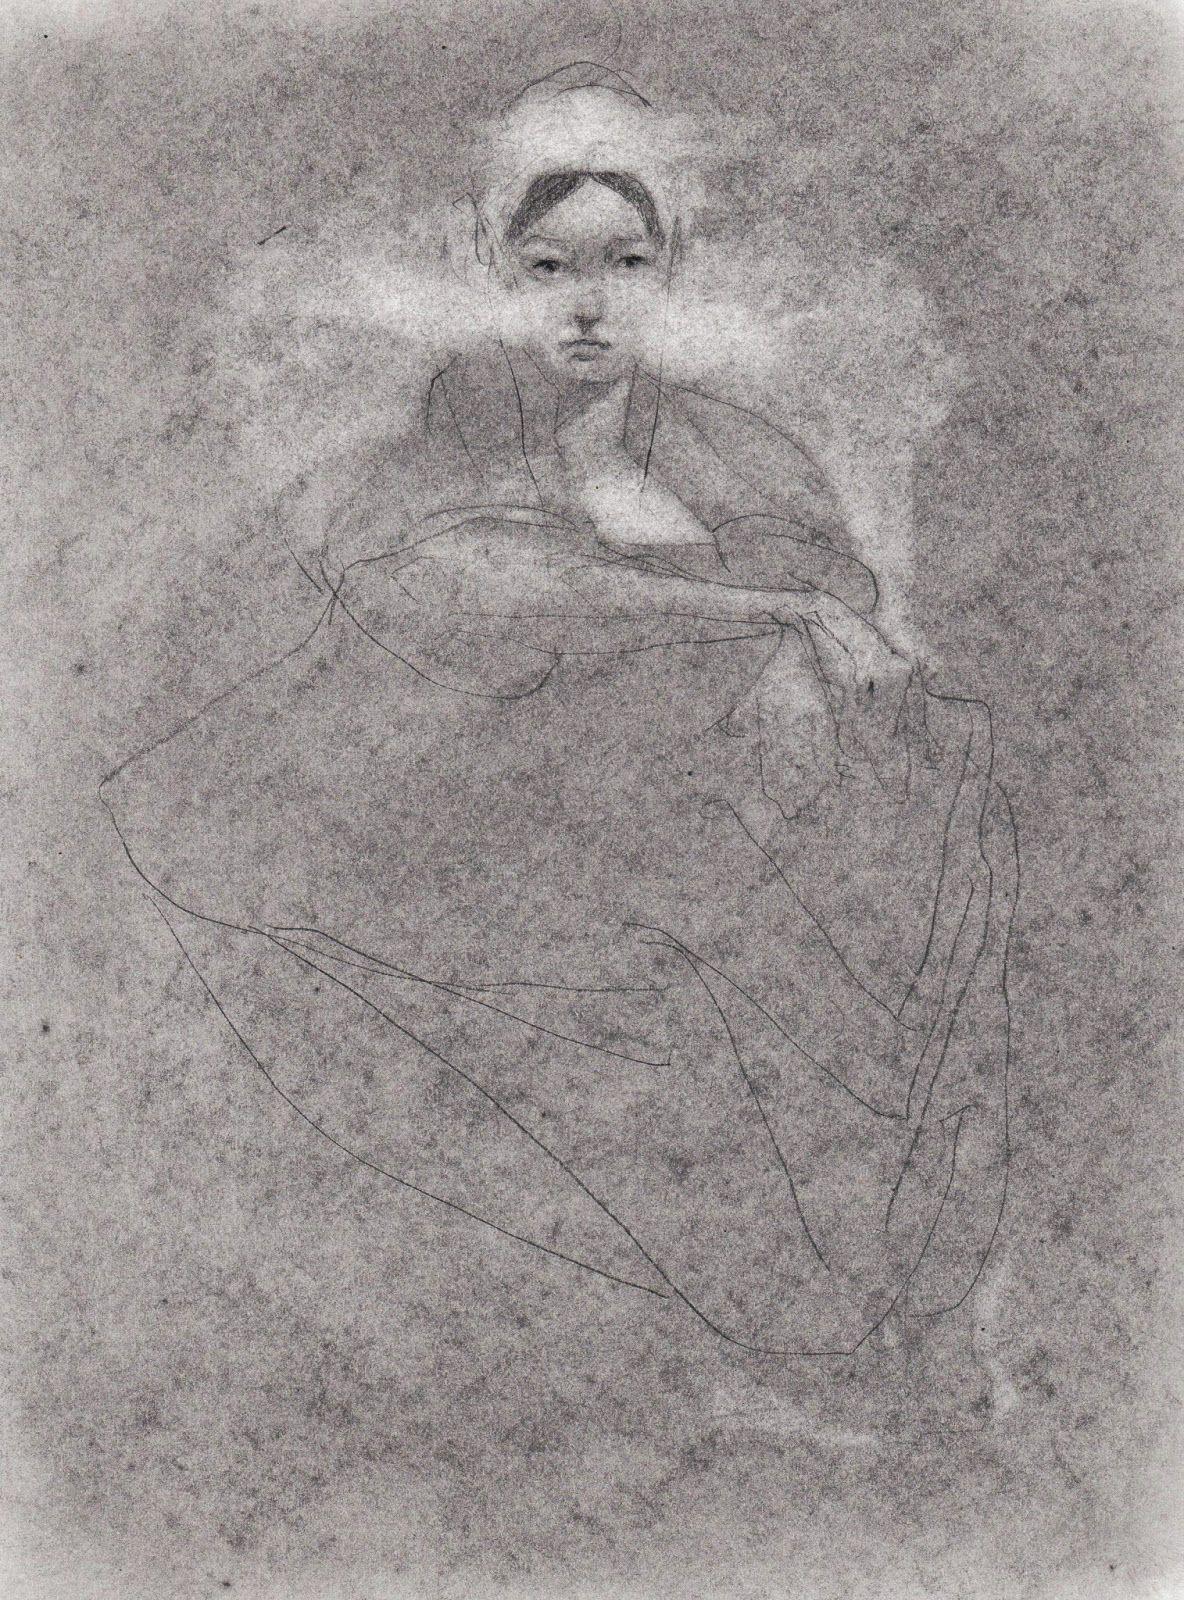 Beatrice I | The Art of Nicholas McNally